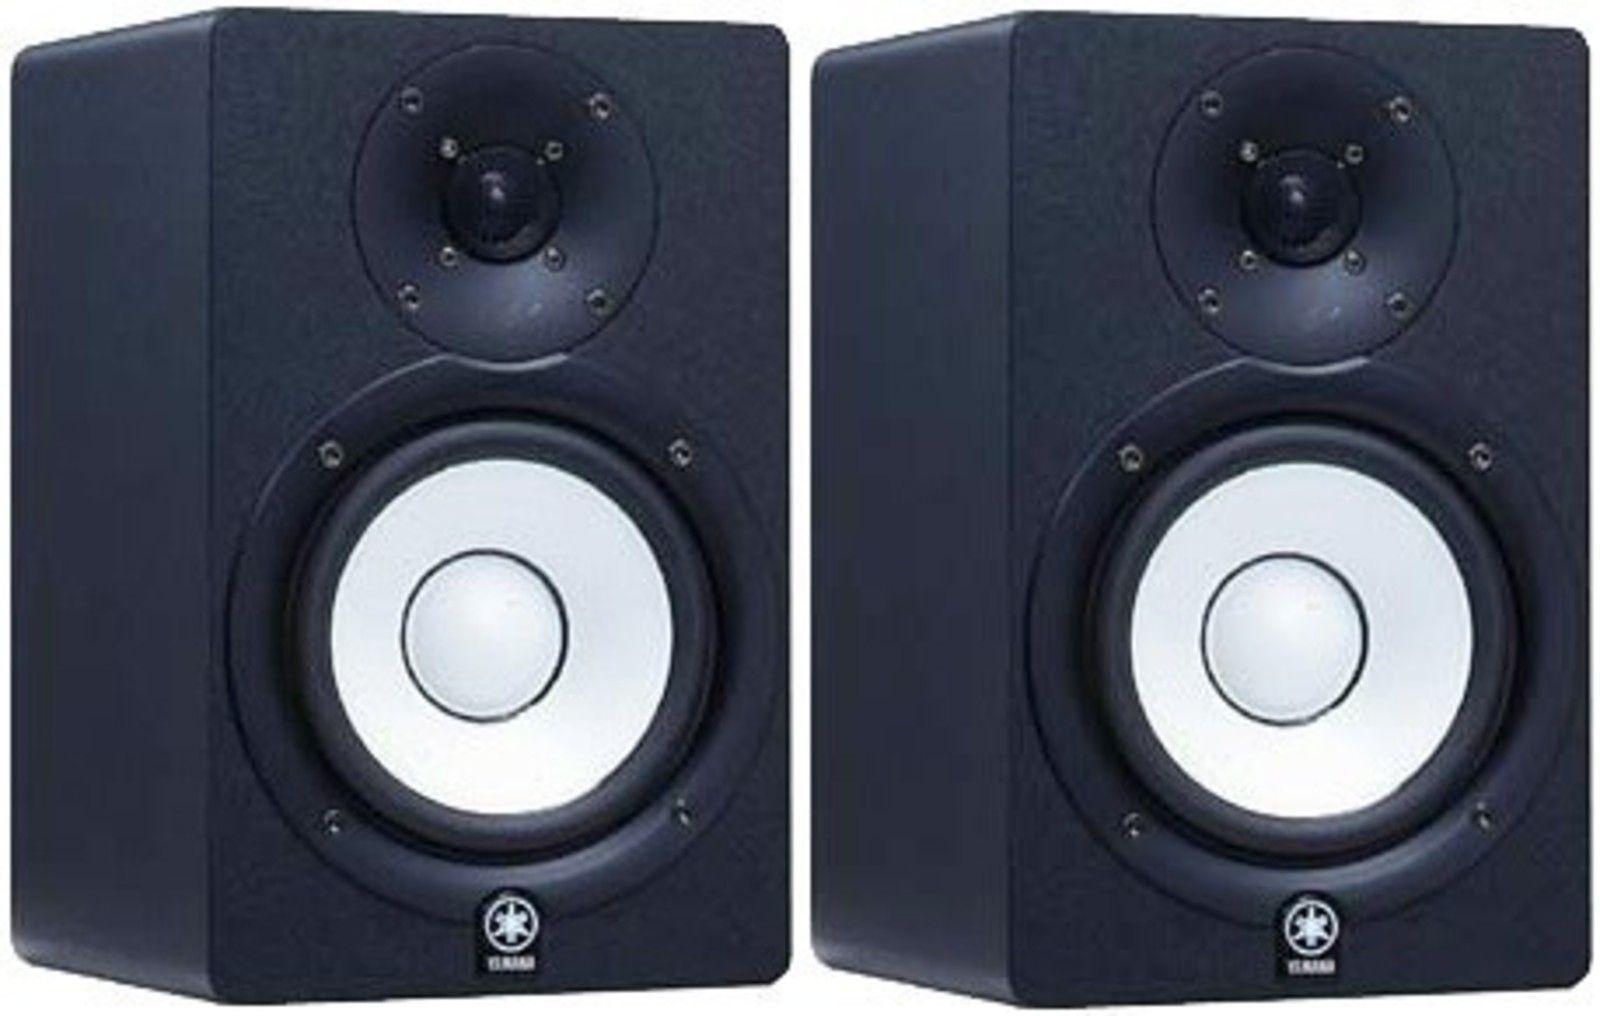 Yamaha hs50m image 11748 audiofanzine for Yamaha hs50m review